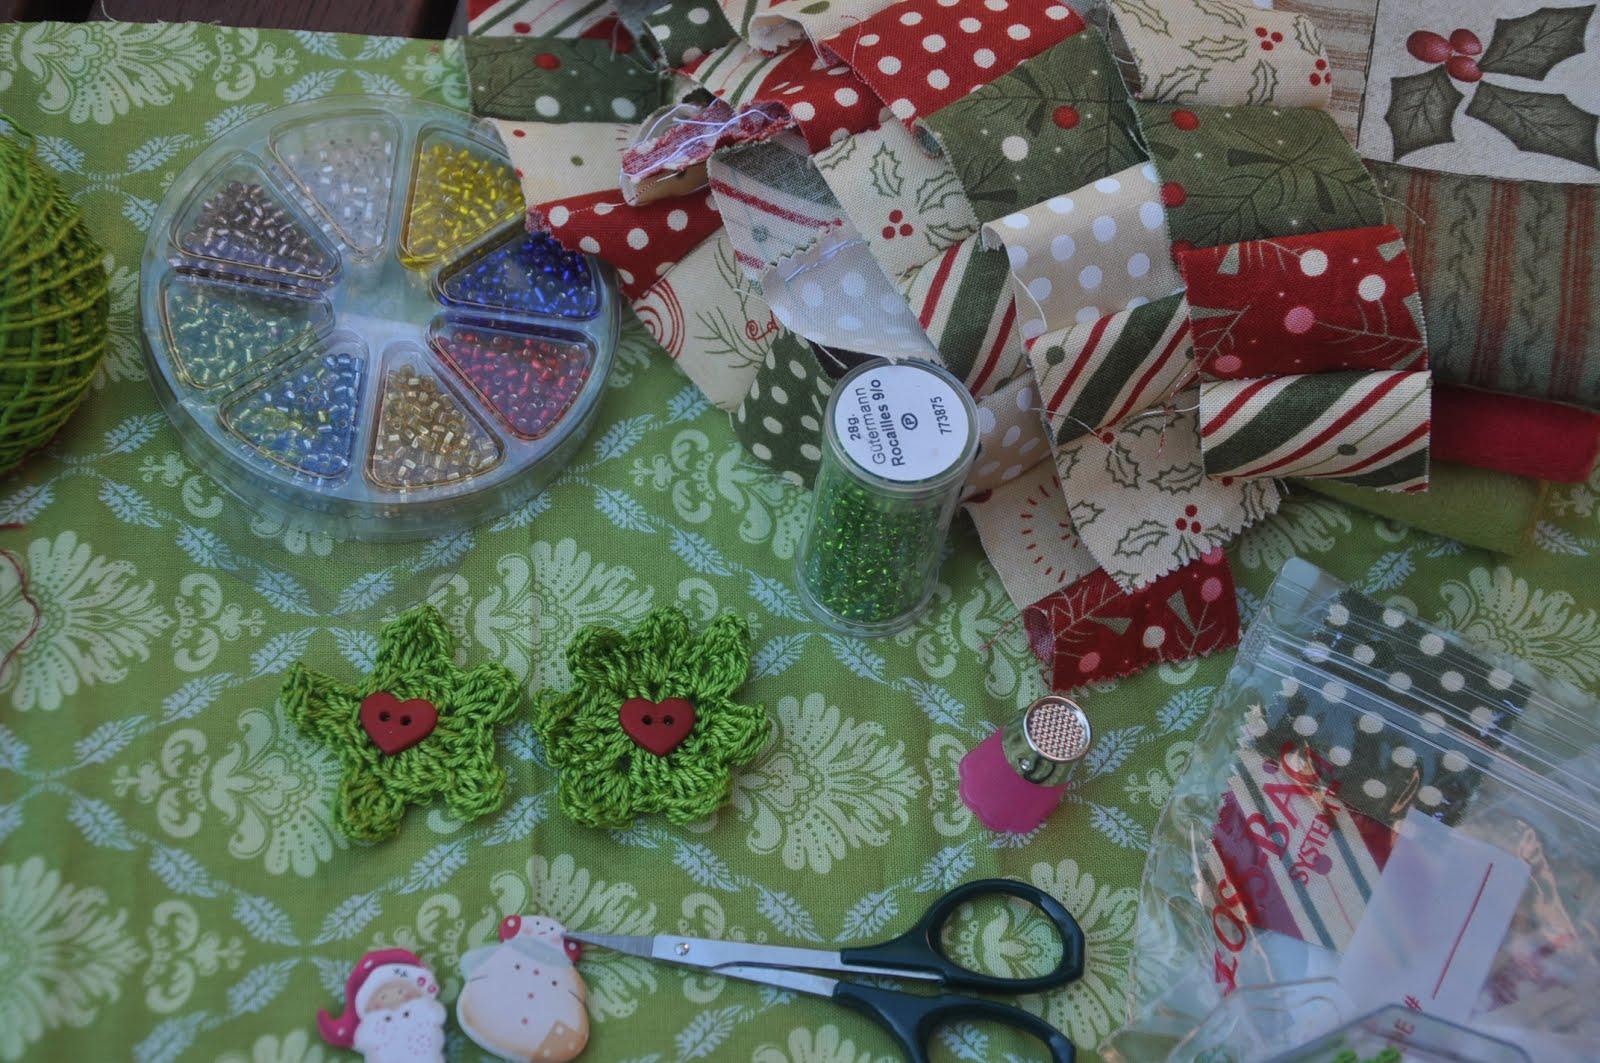 mapeta labores navide as christmas work